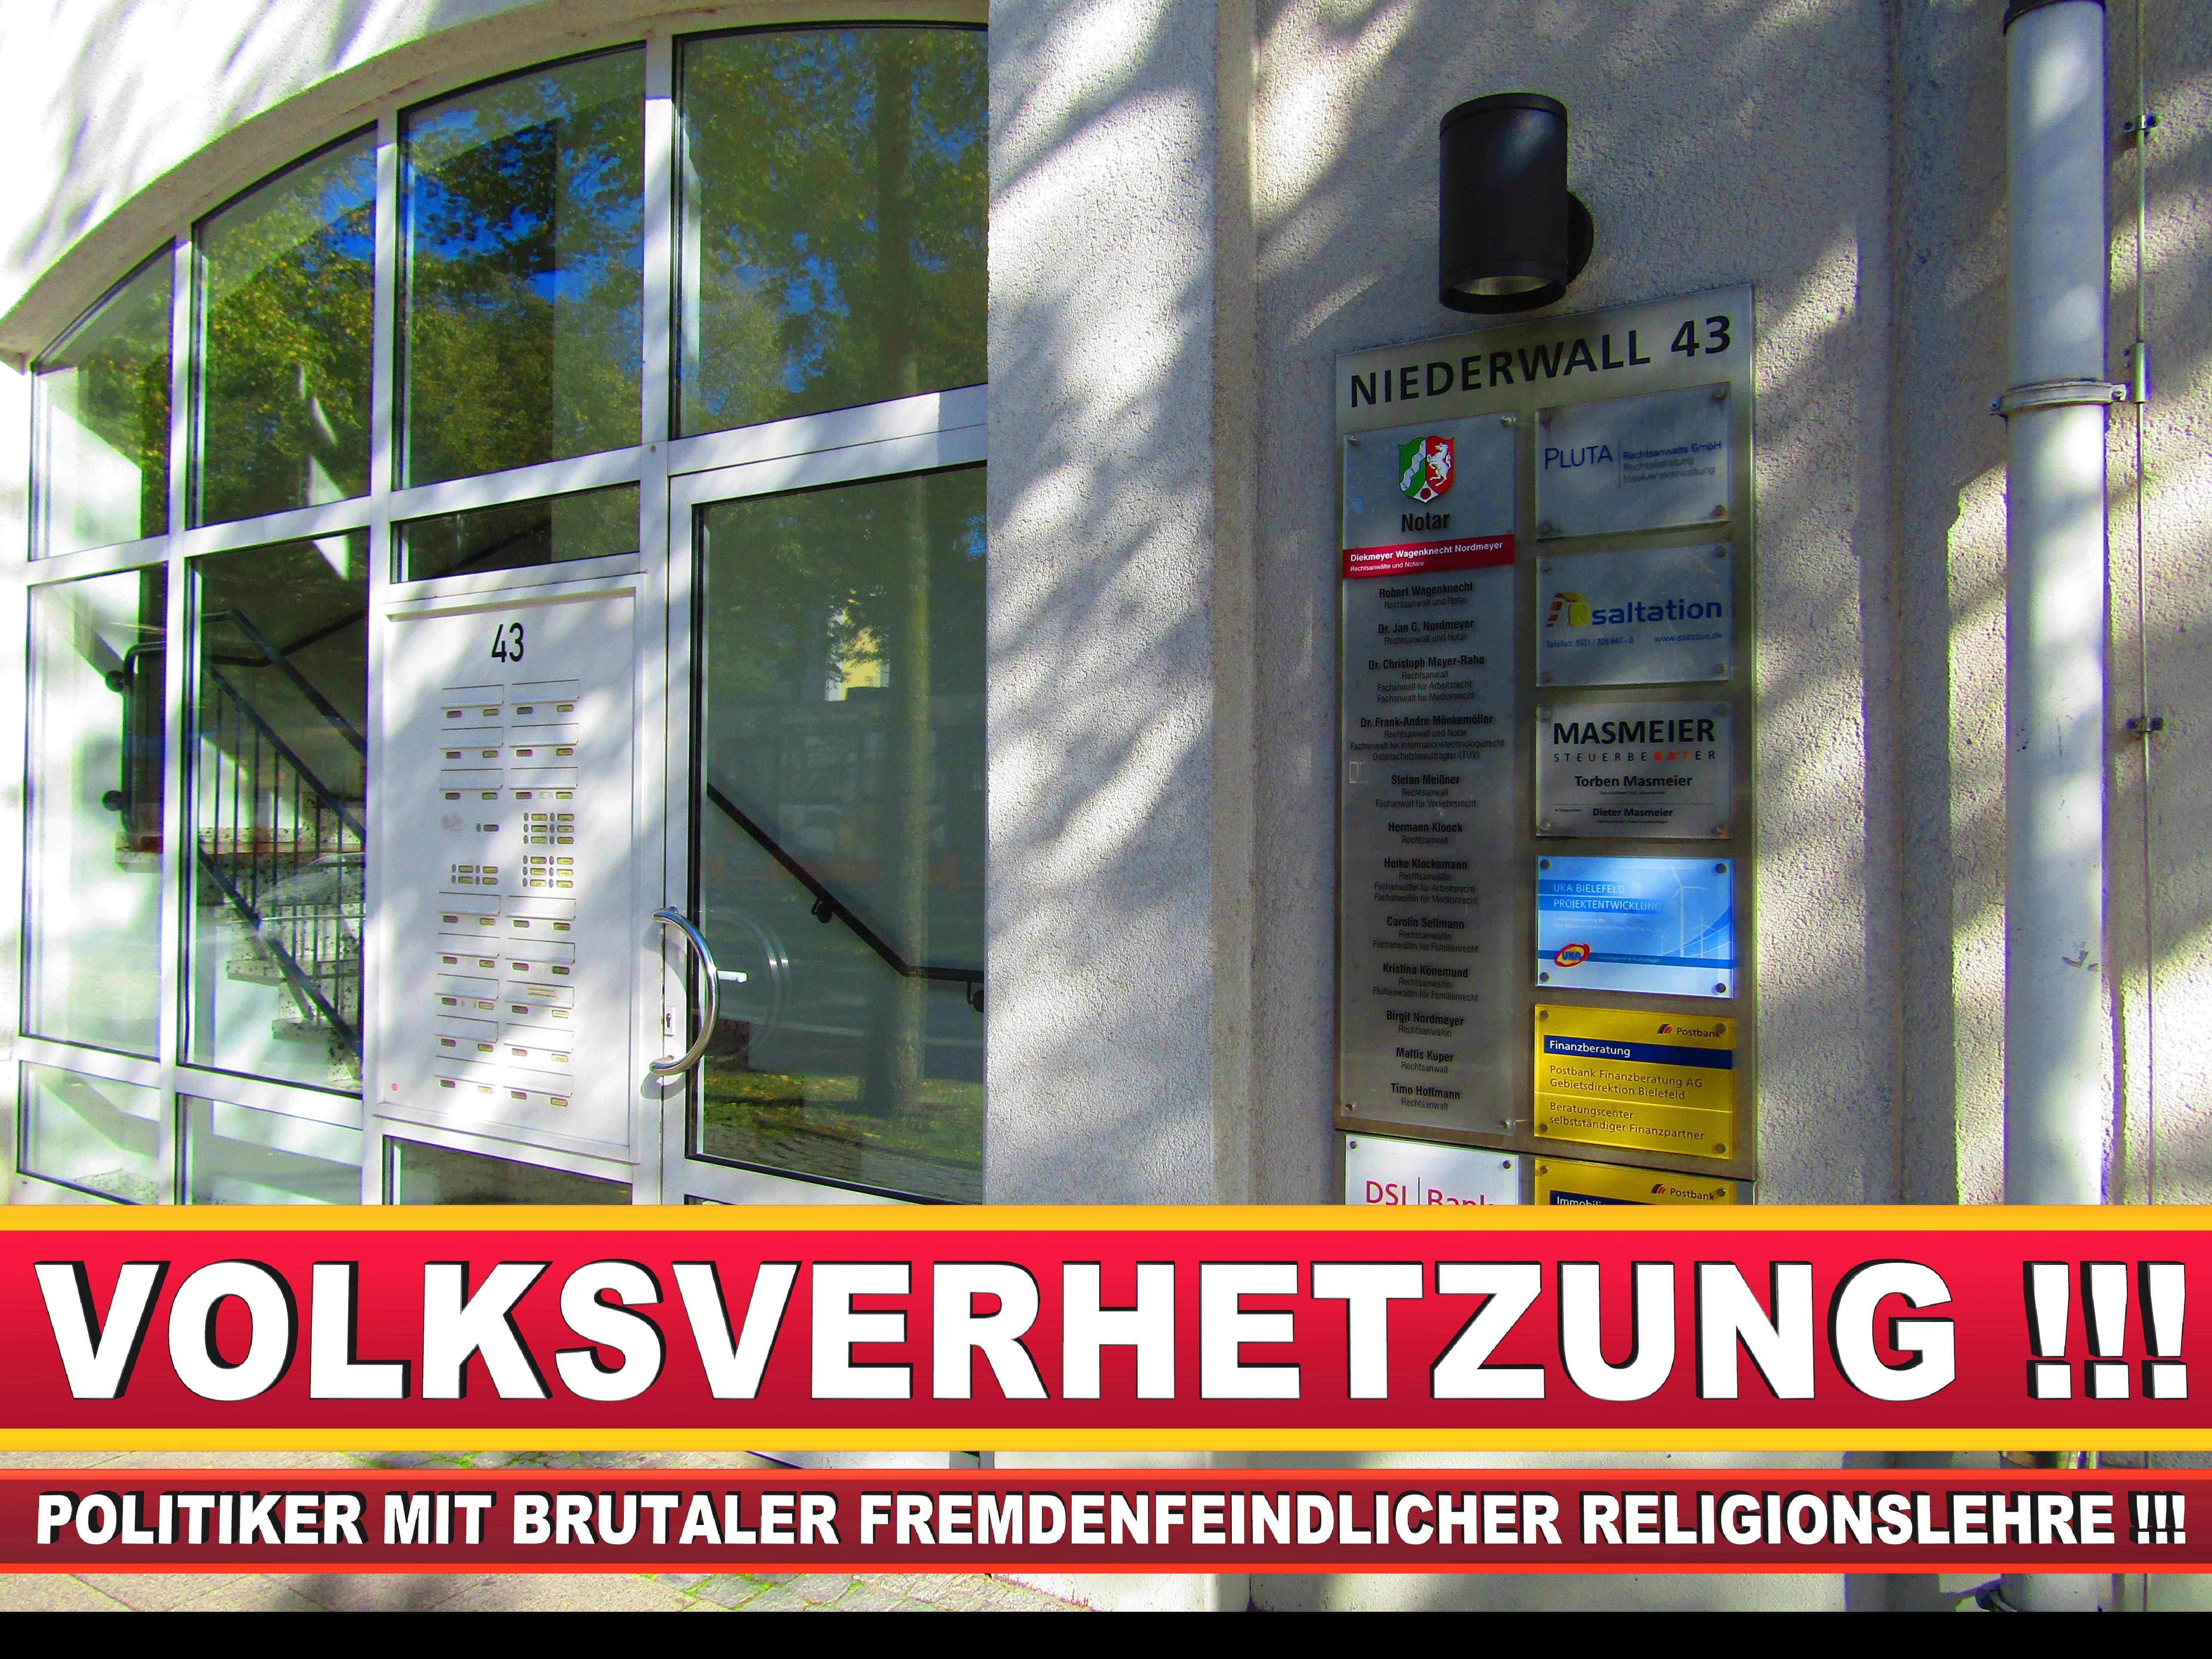 Rechtsanwältin Ricarda Osthus, Niederwall 43 Bielefeld CDU (1)